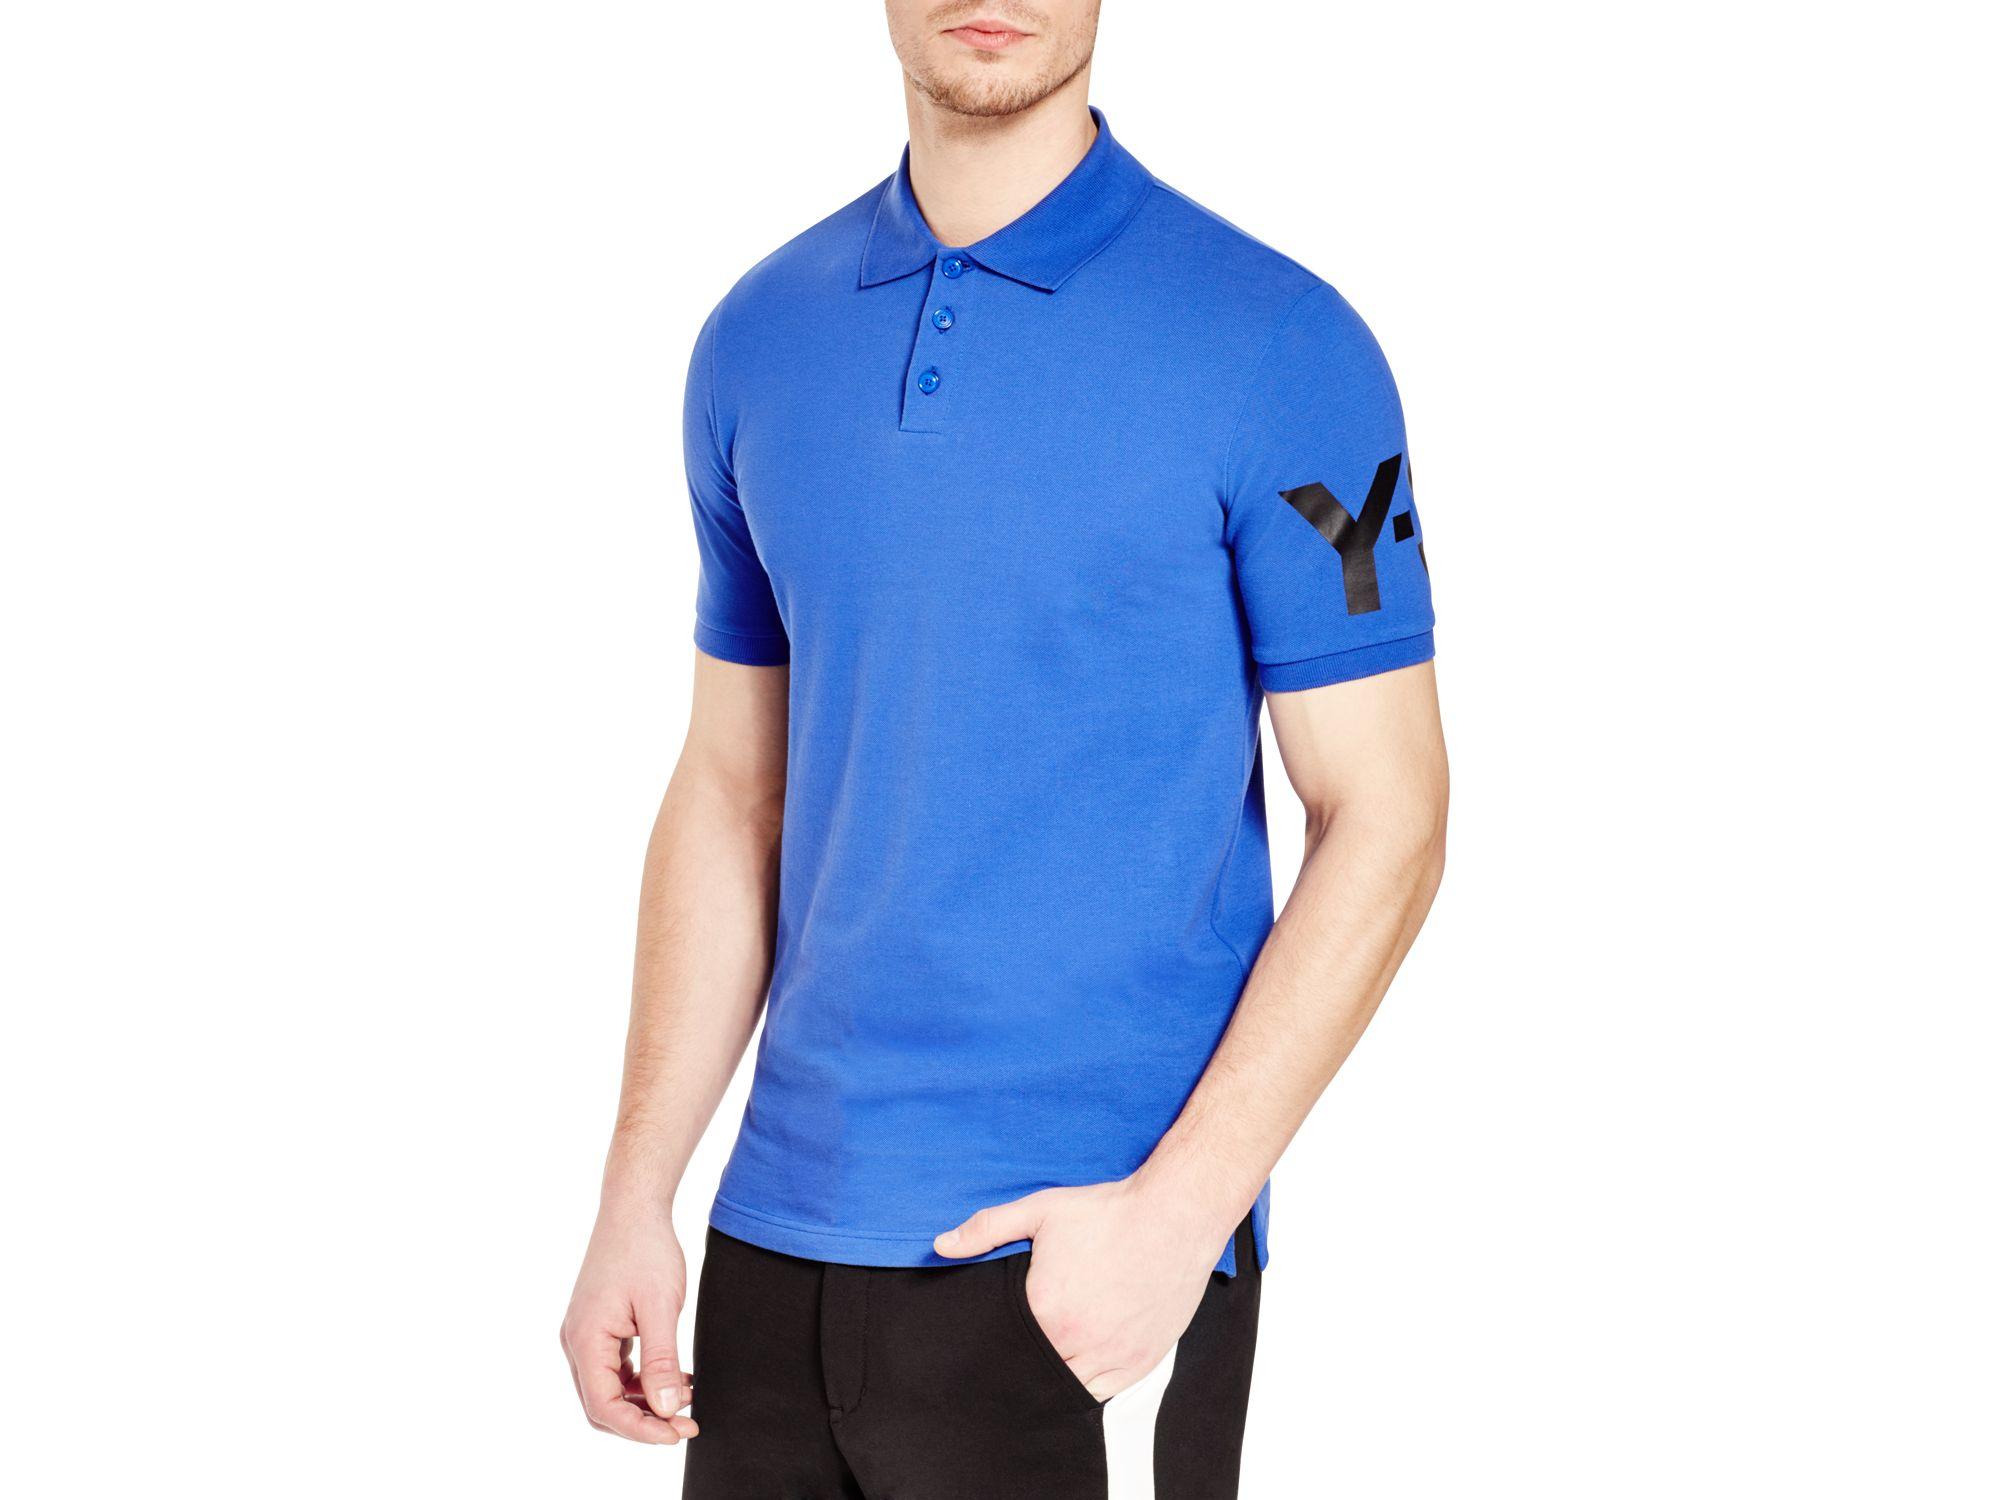 f4446a0d Y3 Classic Polo Shirt - DREAMWORKS